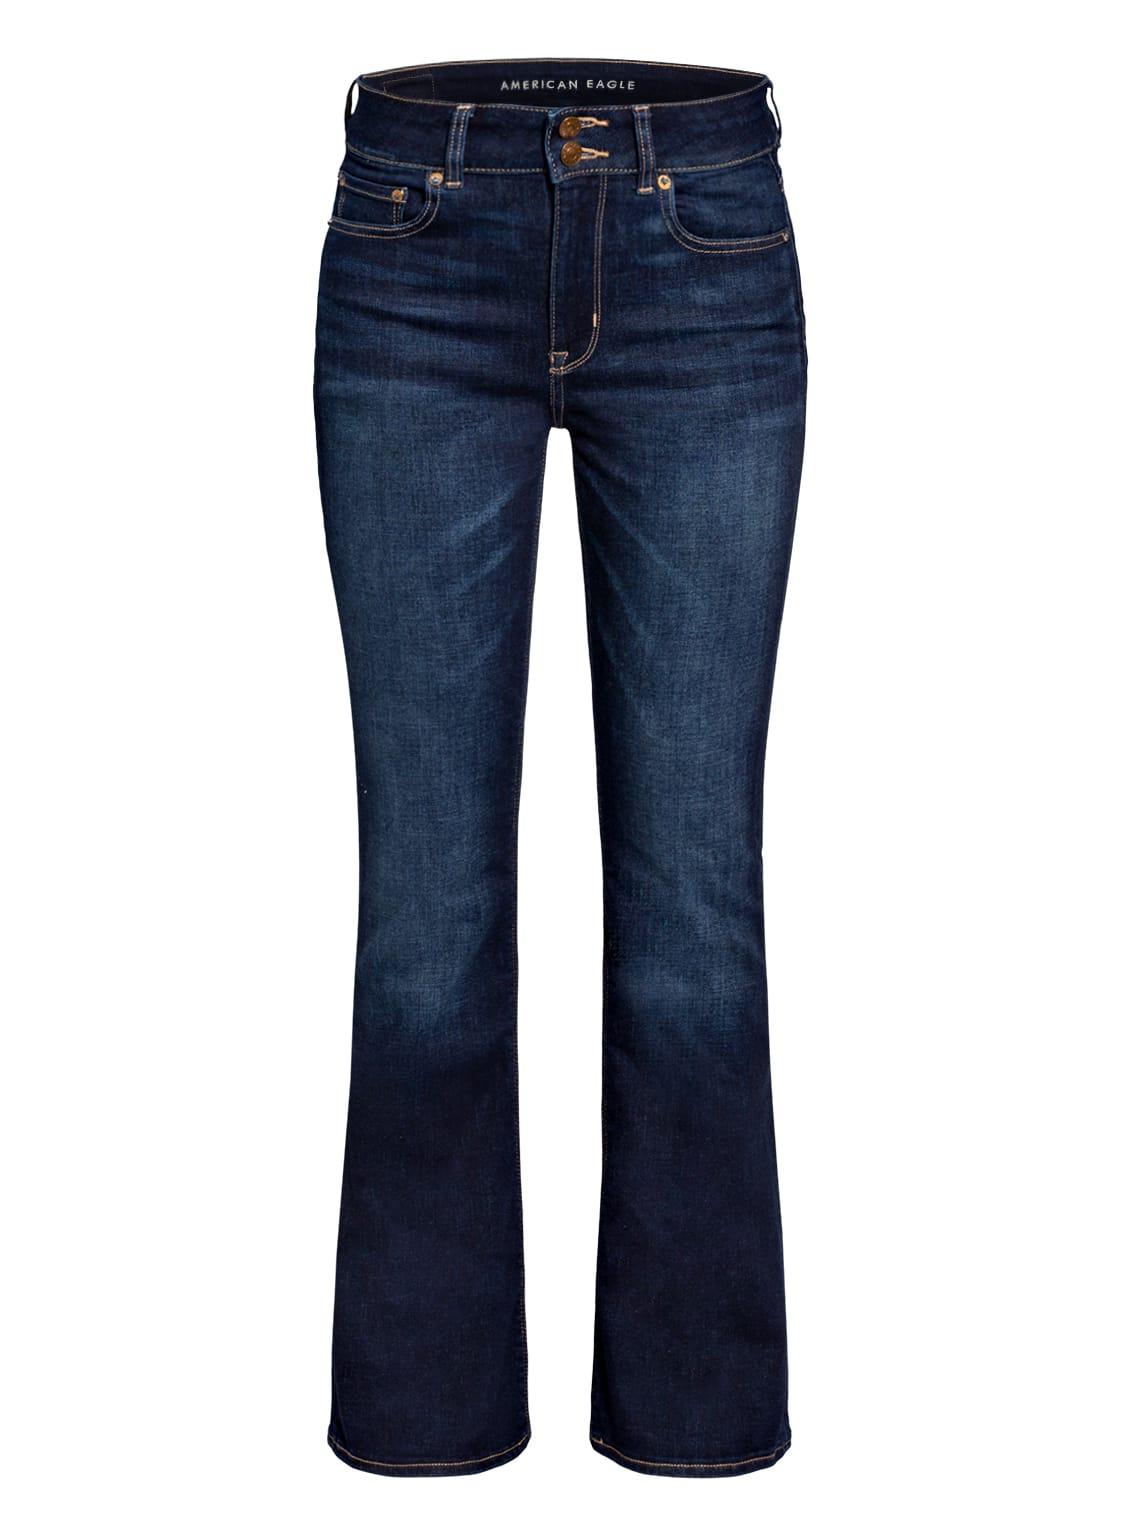 Image of American Eagle Bootcut Jeans blau